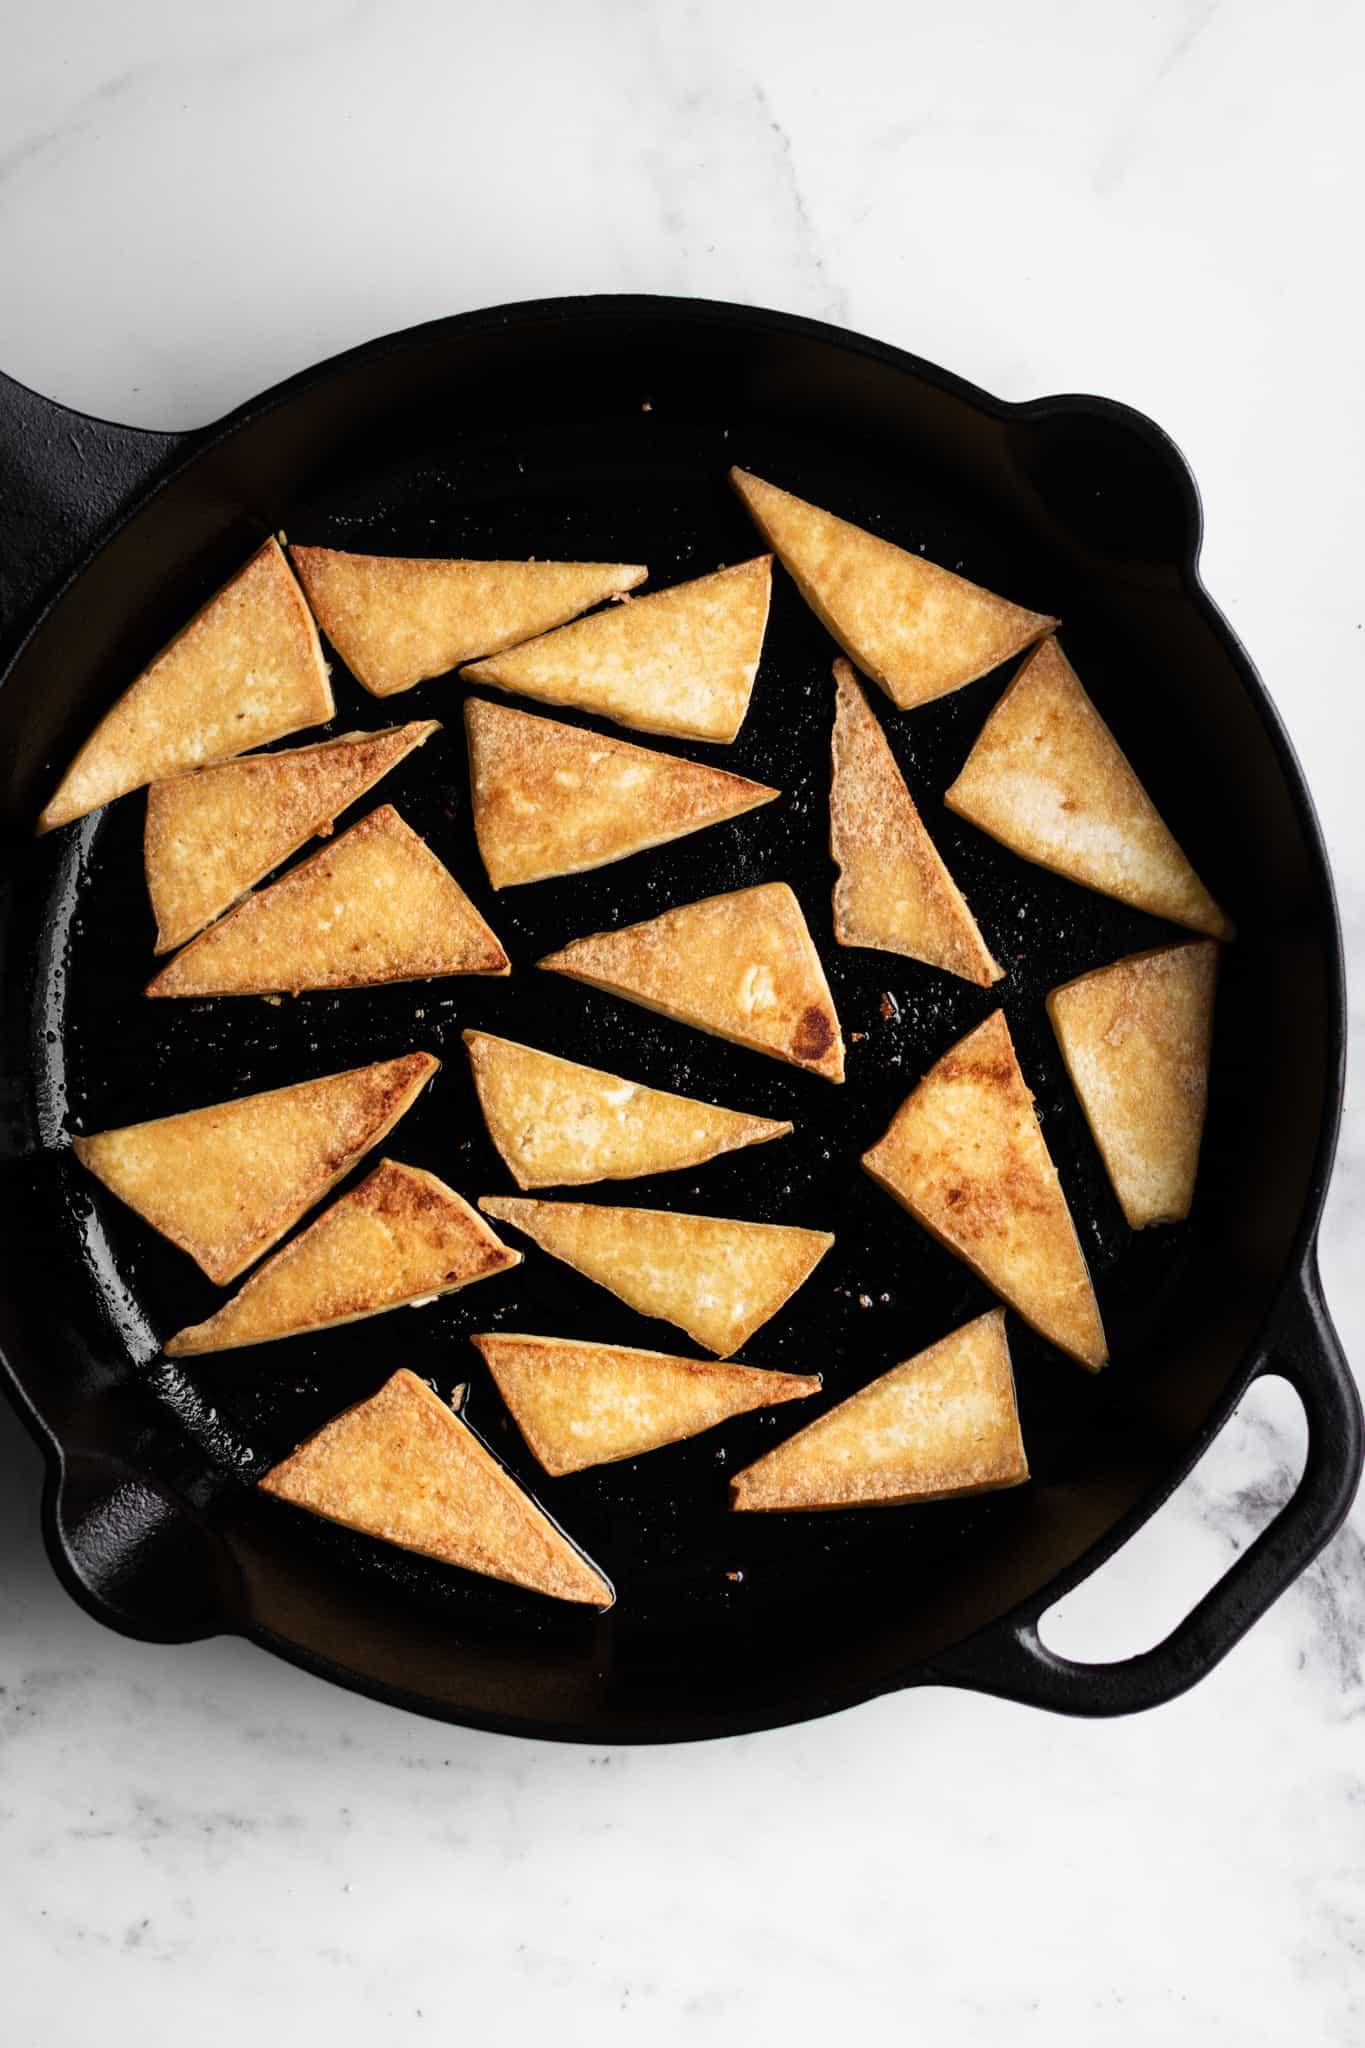 tofu in a cast-iron skillet